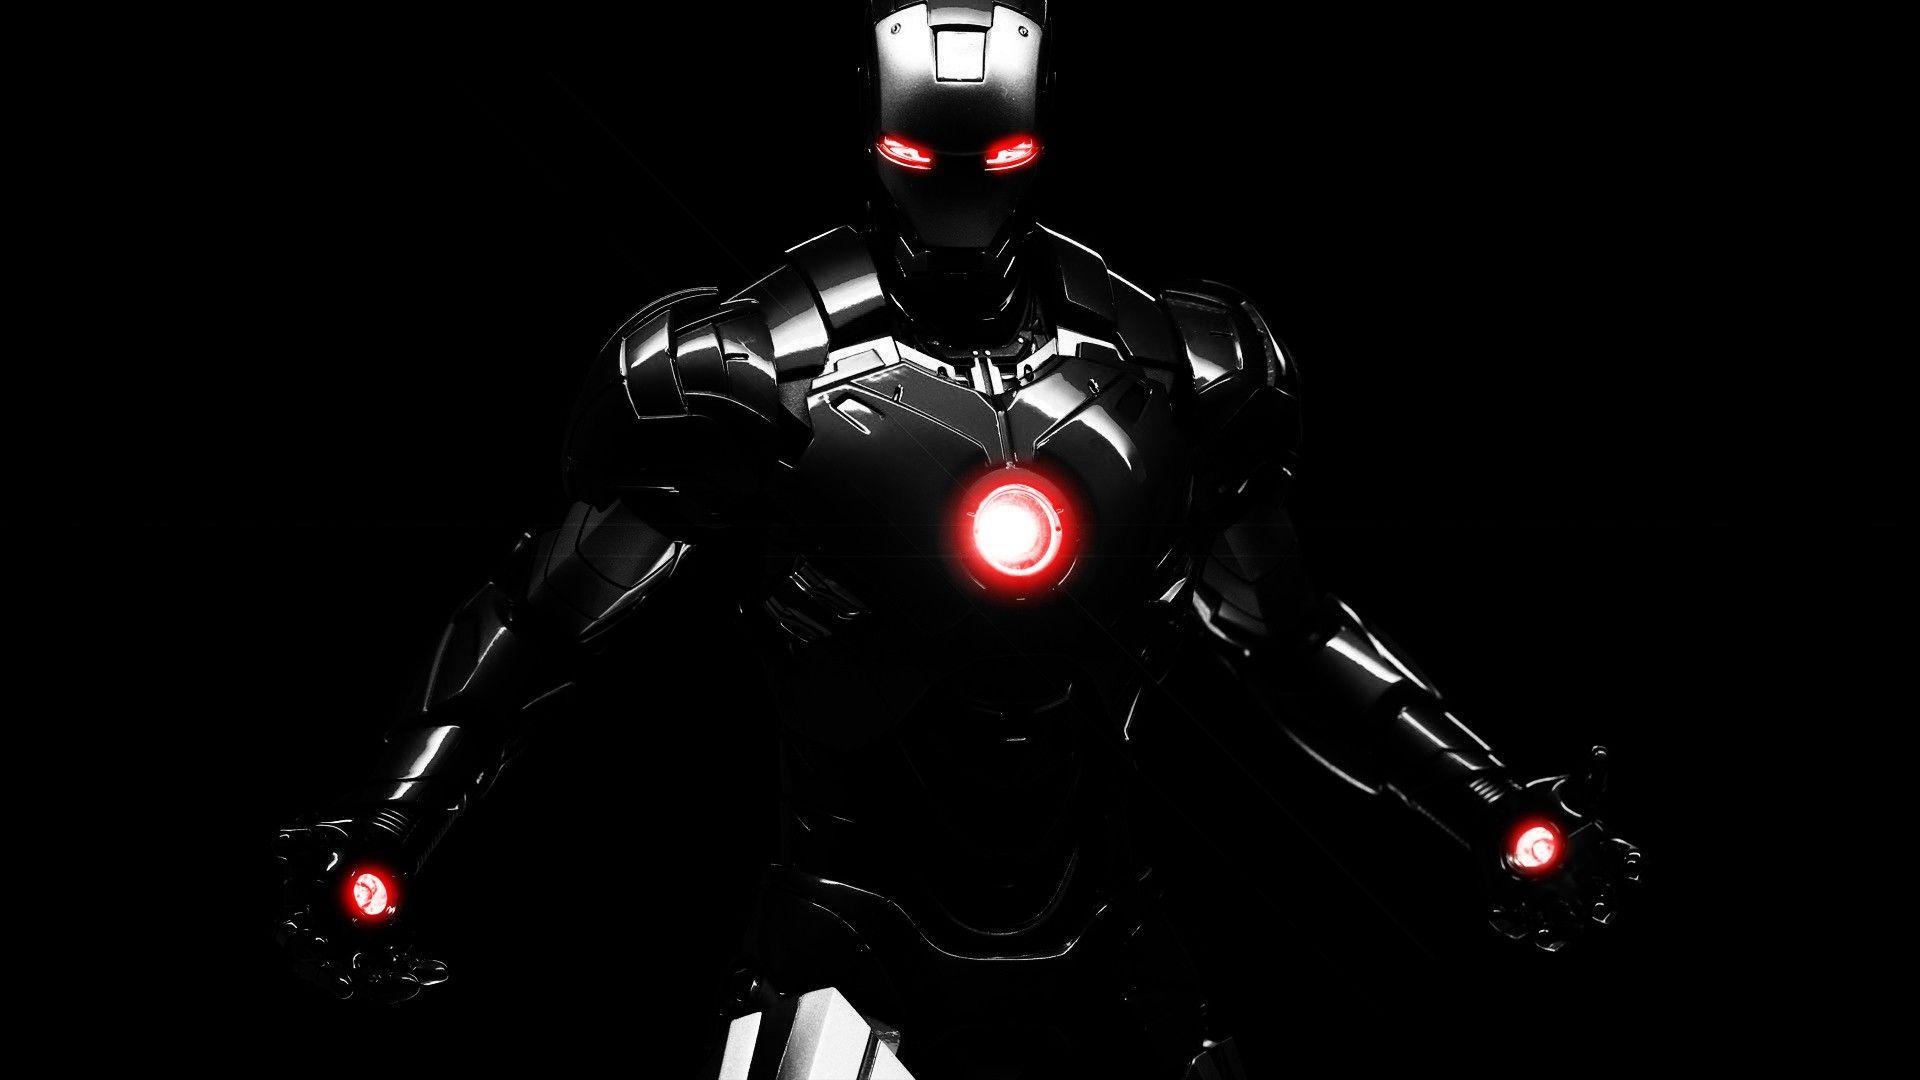 Iron Man Jarvis Wallpapers Sdeerwallpaper 1366x768 Wallpaper Hd Fondo De Pantalla De Iron Man Magnificos